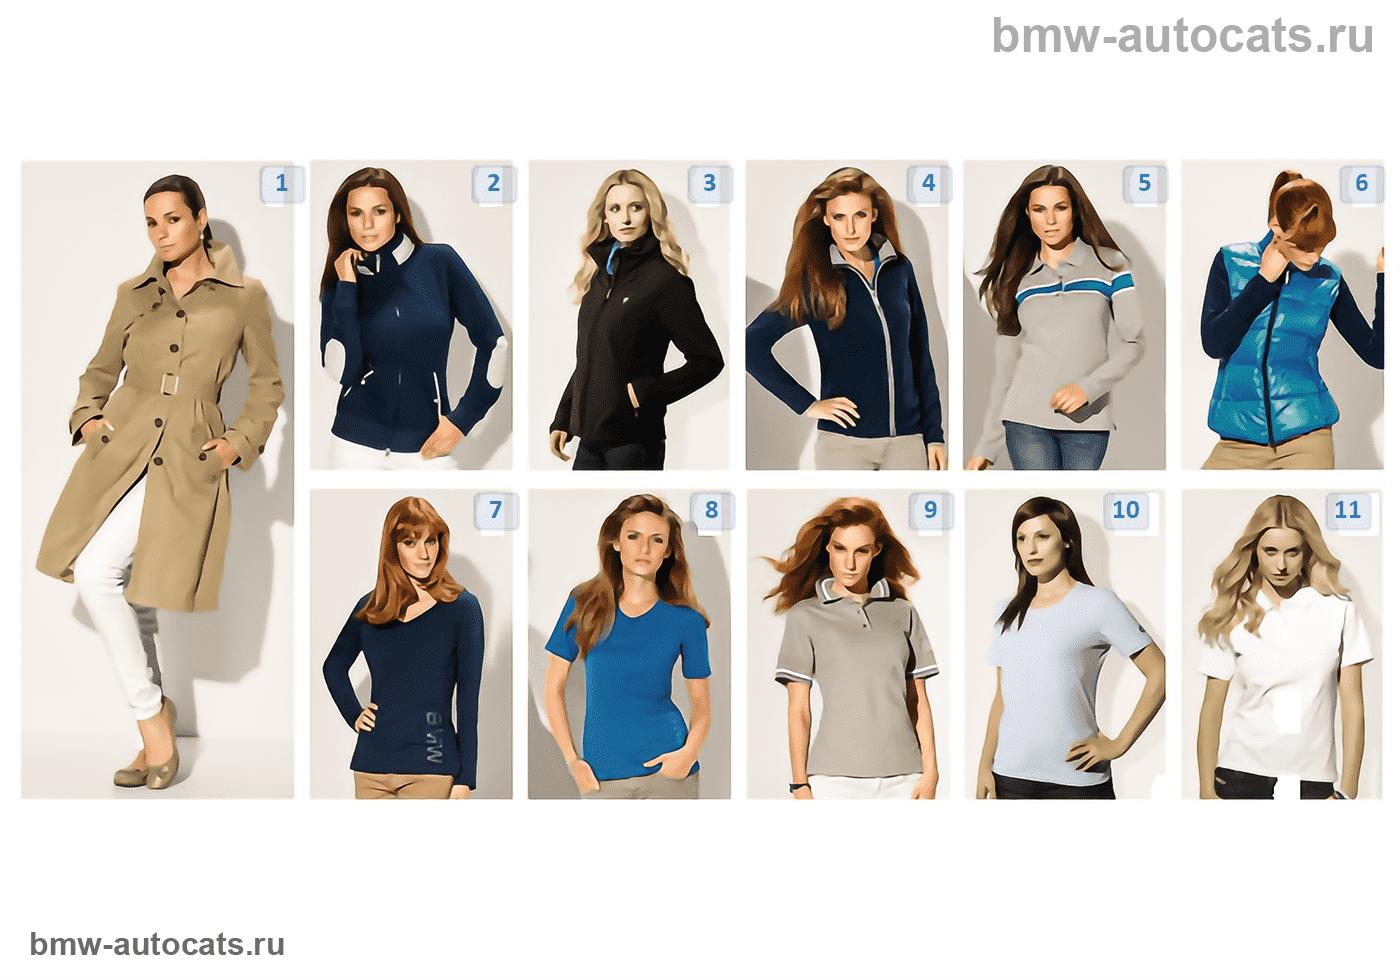 BMW Collection — женская одежда 2012/13